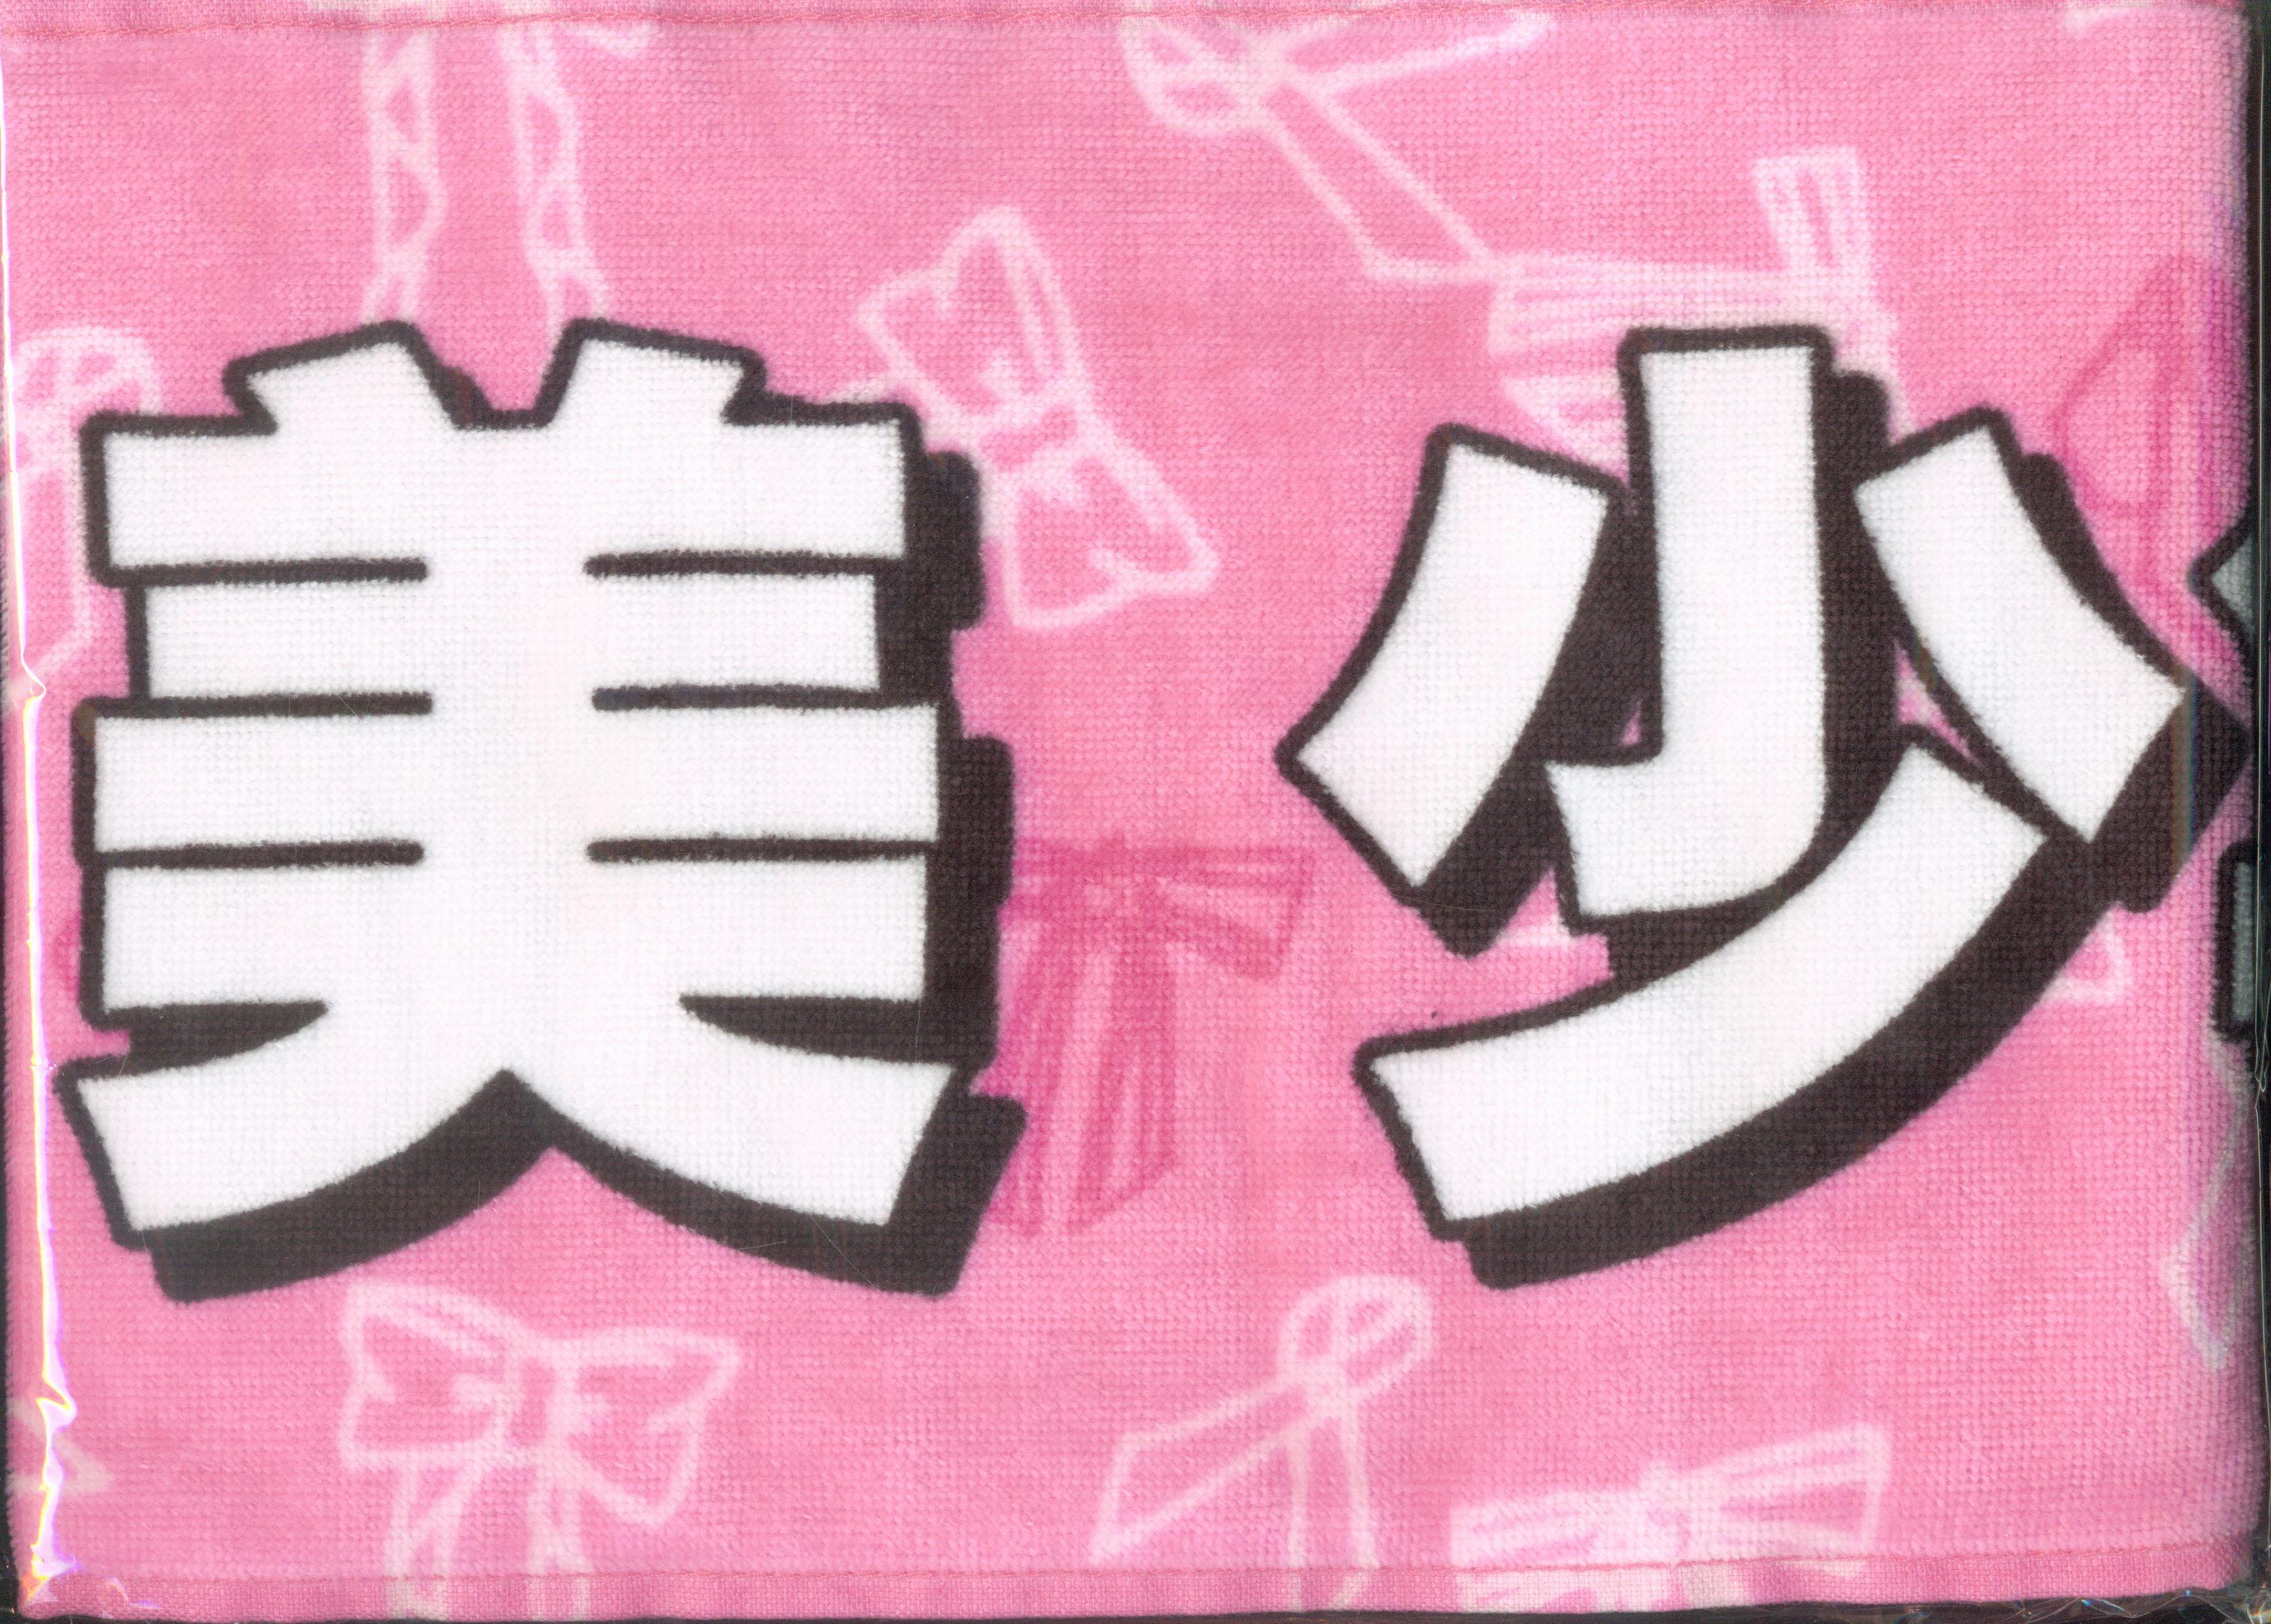 Jr 祭り 8.8 ジャニーズ